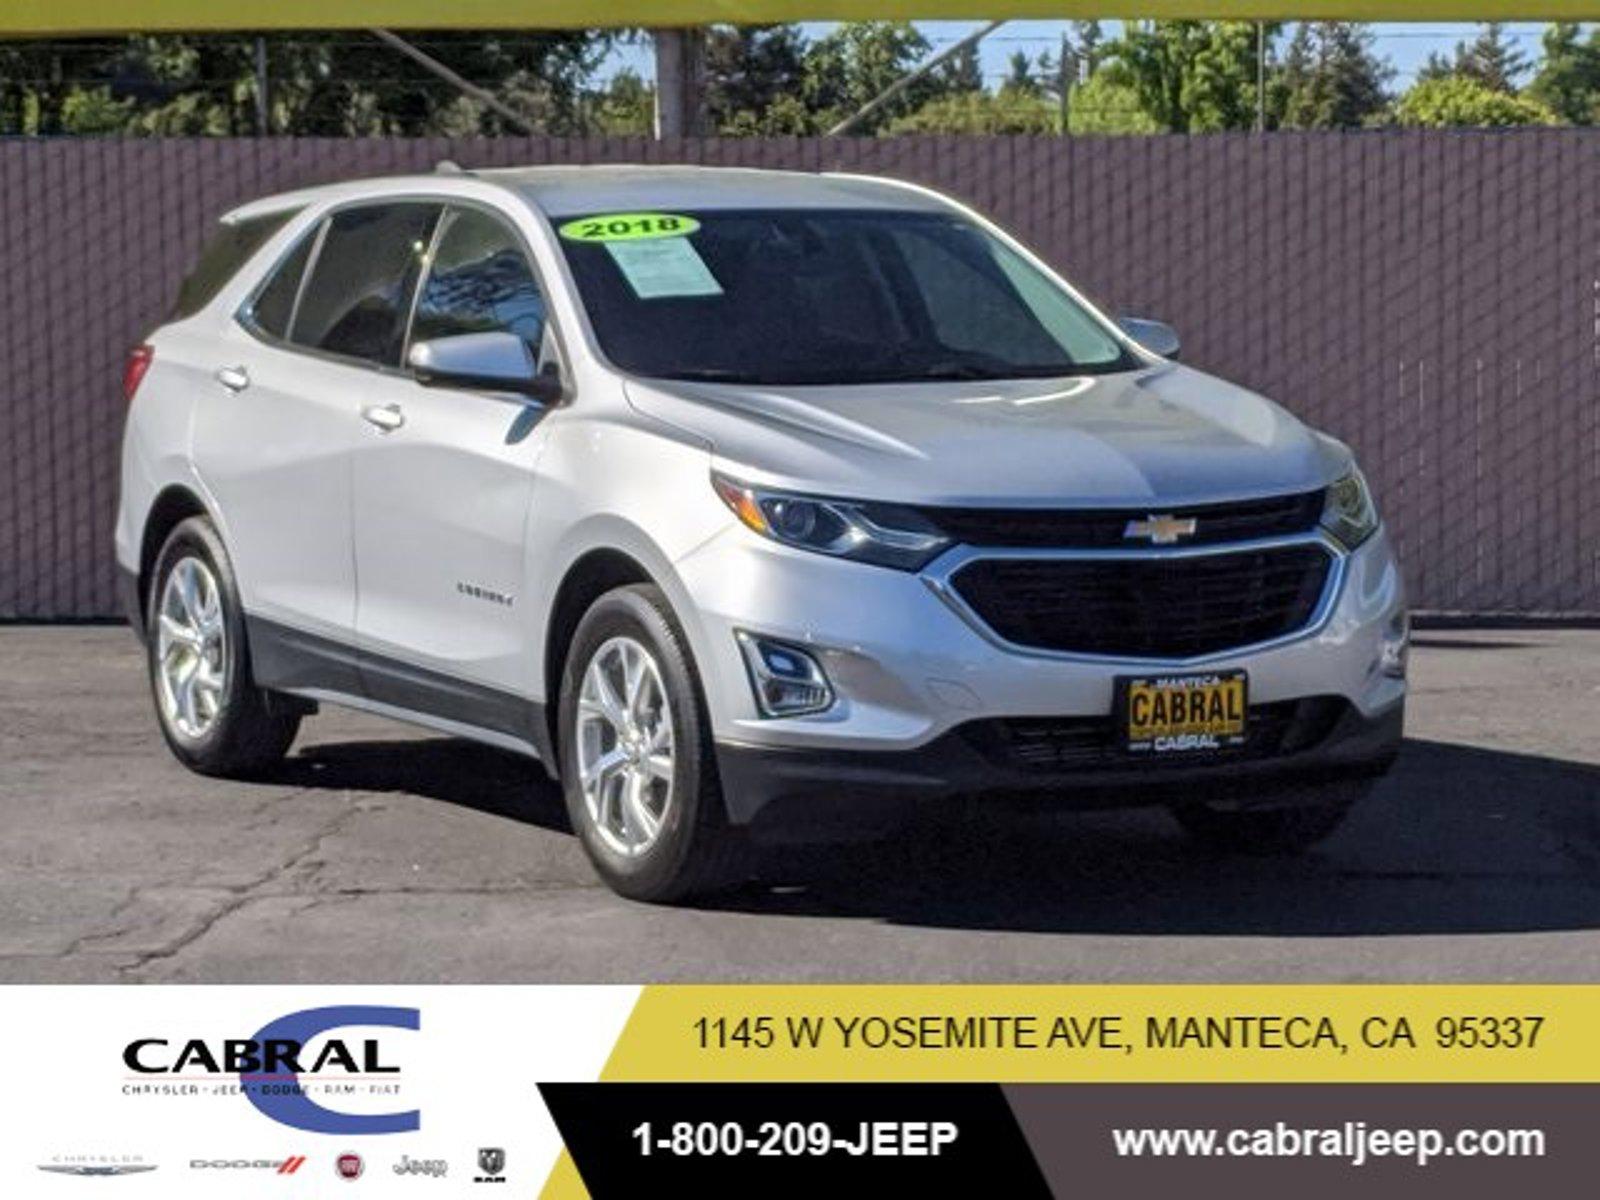 2018 Chevrolet Equinox LT FWD 4dr LT w/2LT Turbocharged Gas I4 2.0L/ [1]